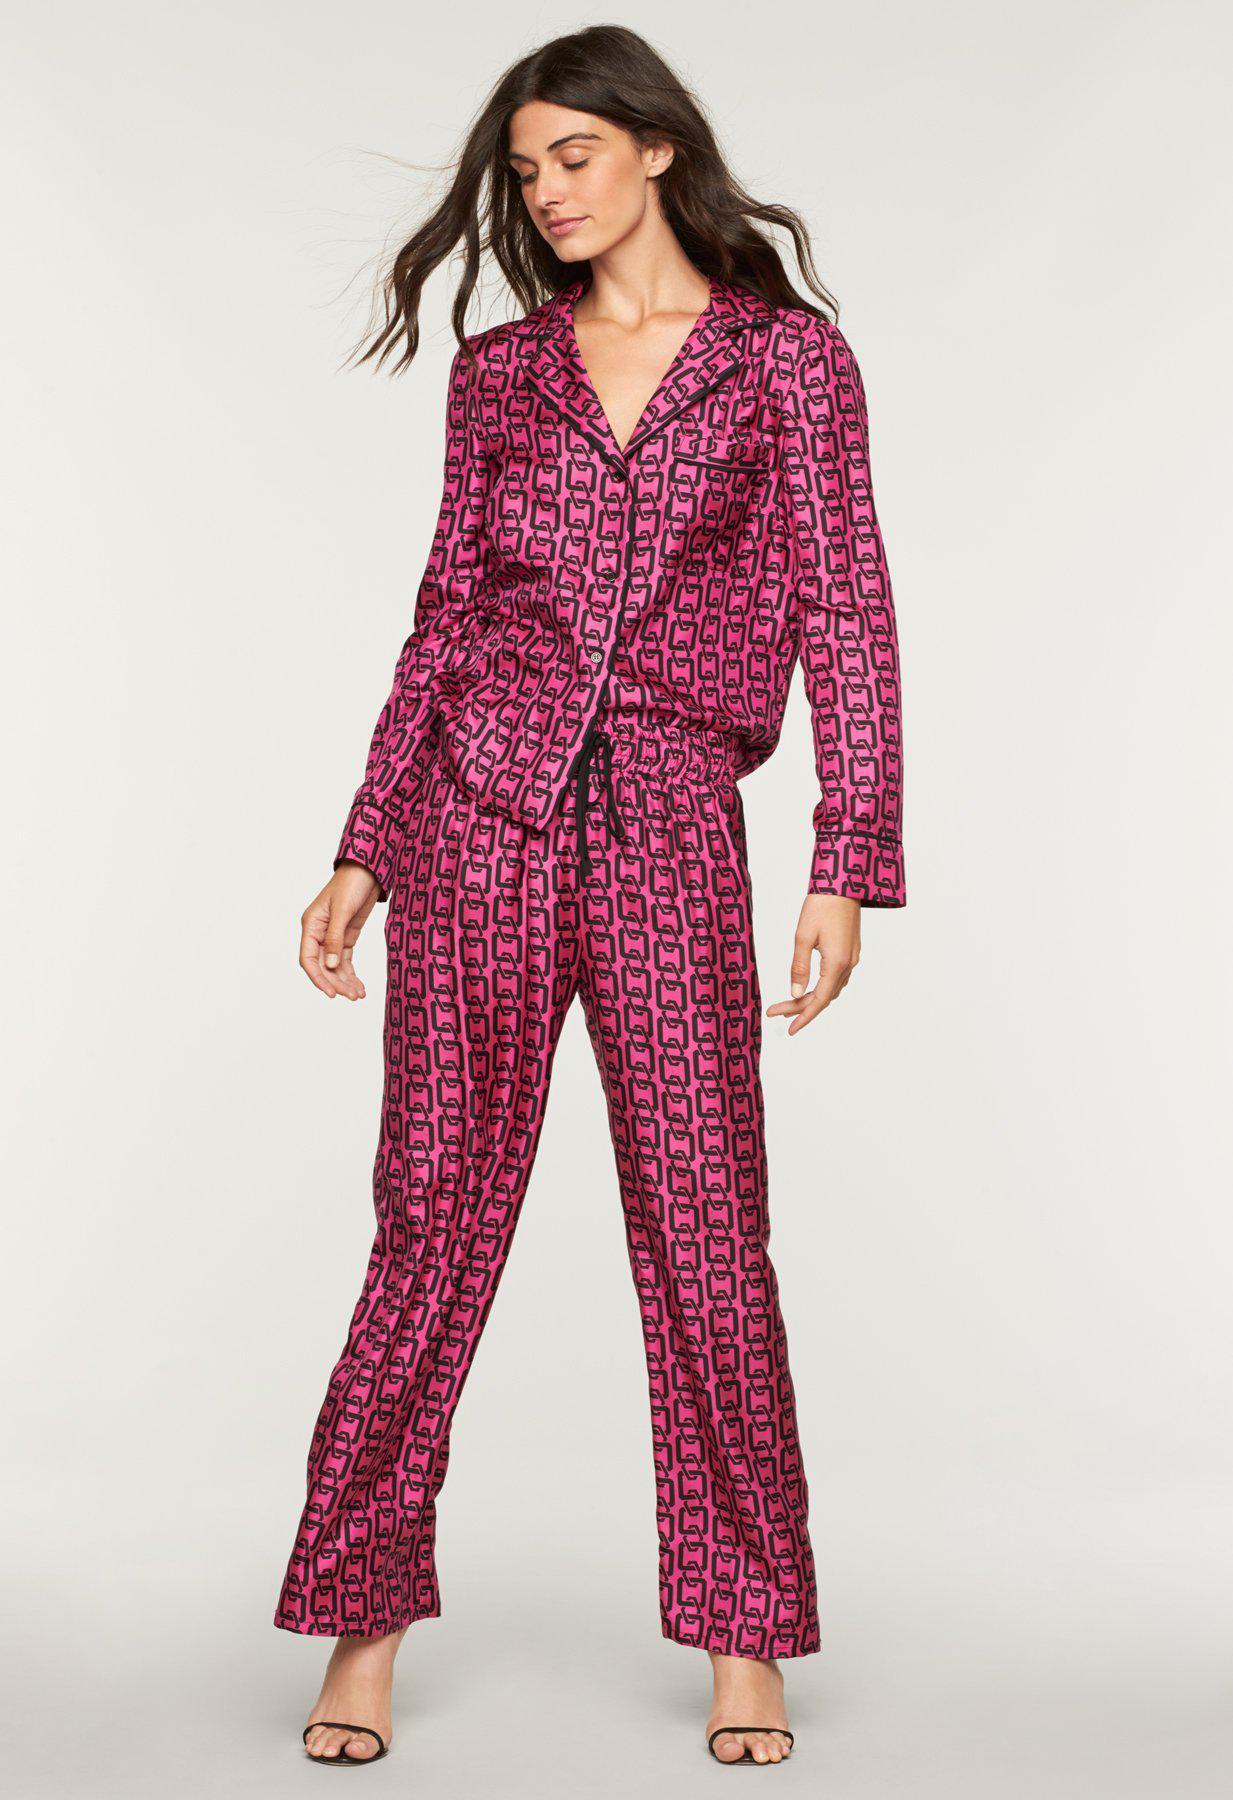 d56c62c08e ... Chain Print Pajama Top - Lyst. View fullscreen